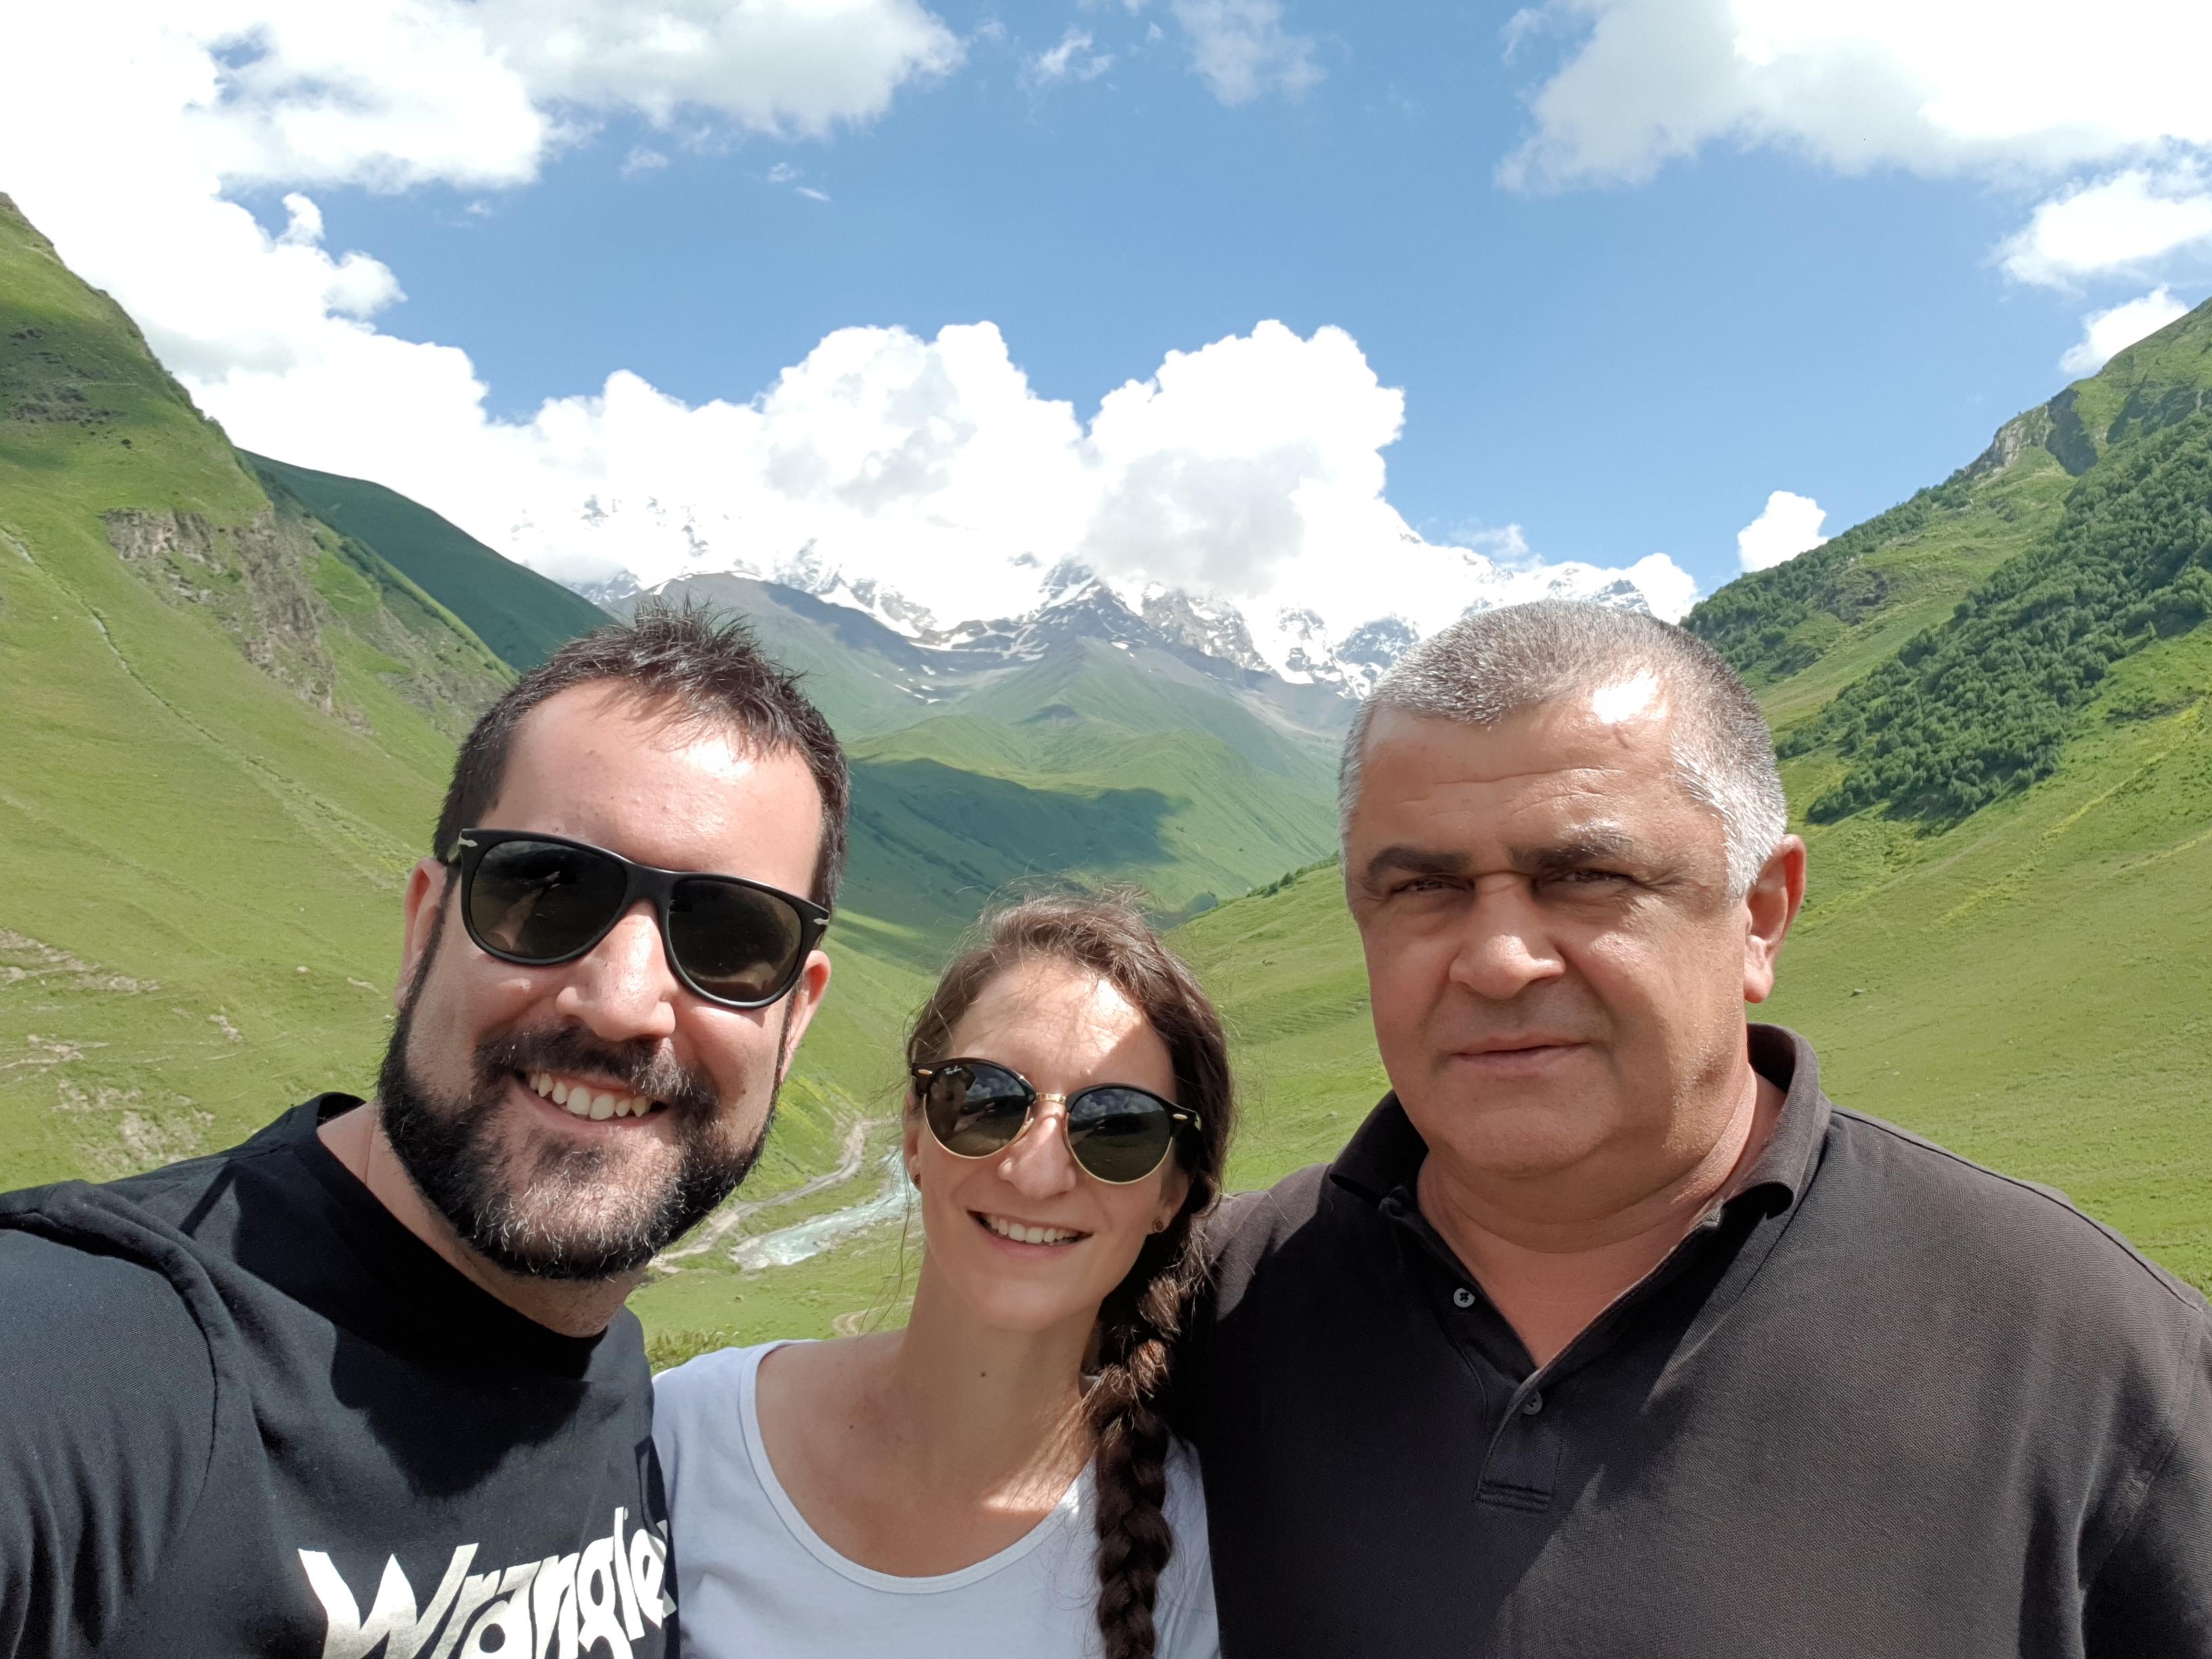 Desde Ushguli, con el pico Sjara